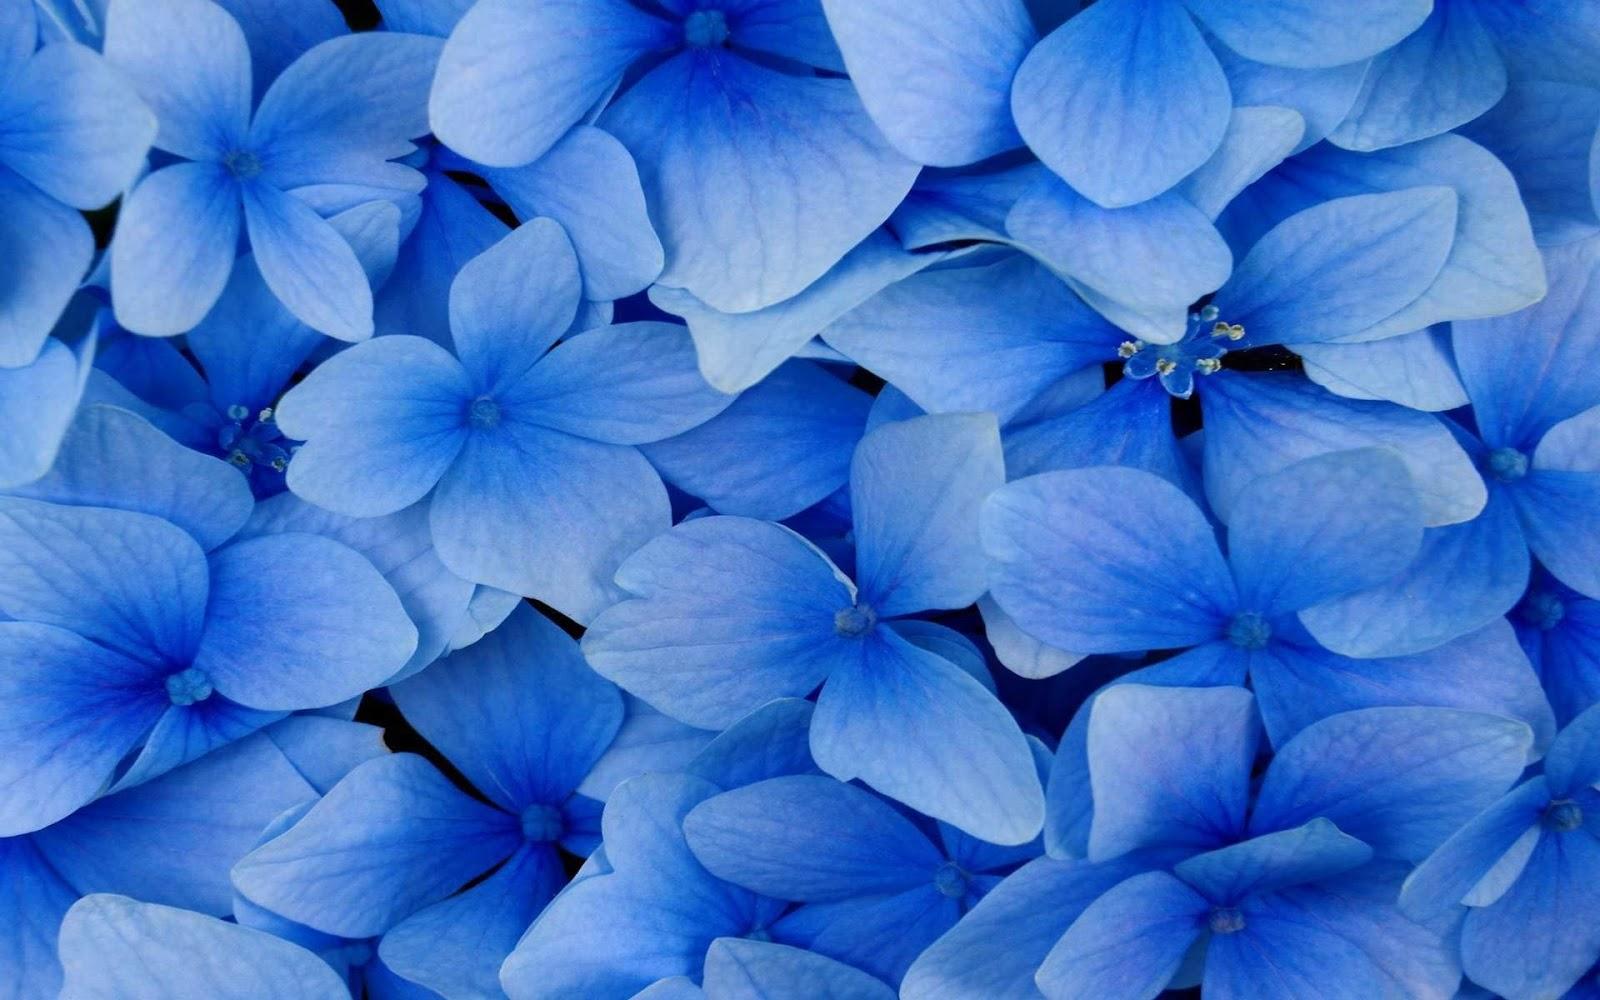 Dark blue and white wallpaper wallpapersafari black and white wallpapers close up blue flowers blue wallpaper dhlflorist Images